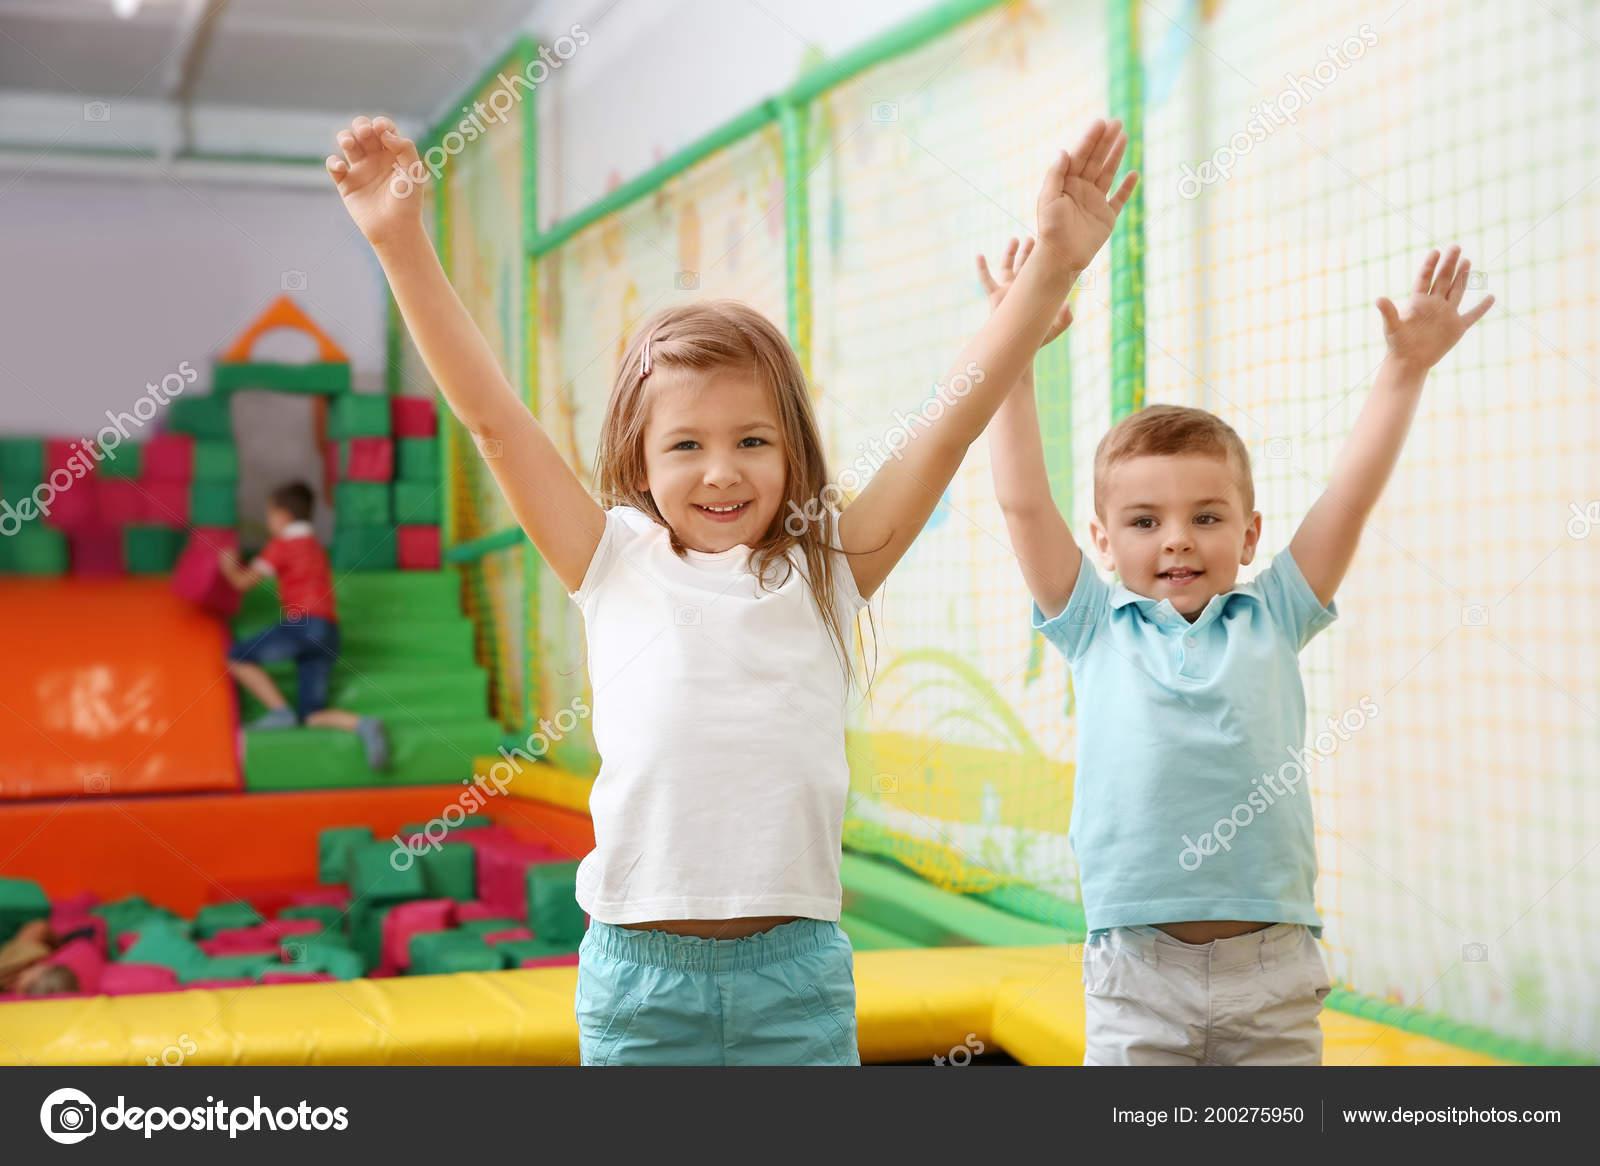 689aadac771 Χαριτωμένα Παιδιά Που Παίζουν Στο Κέντρο Ψυχαγωγίας — Φωτογραφία Αρχείου